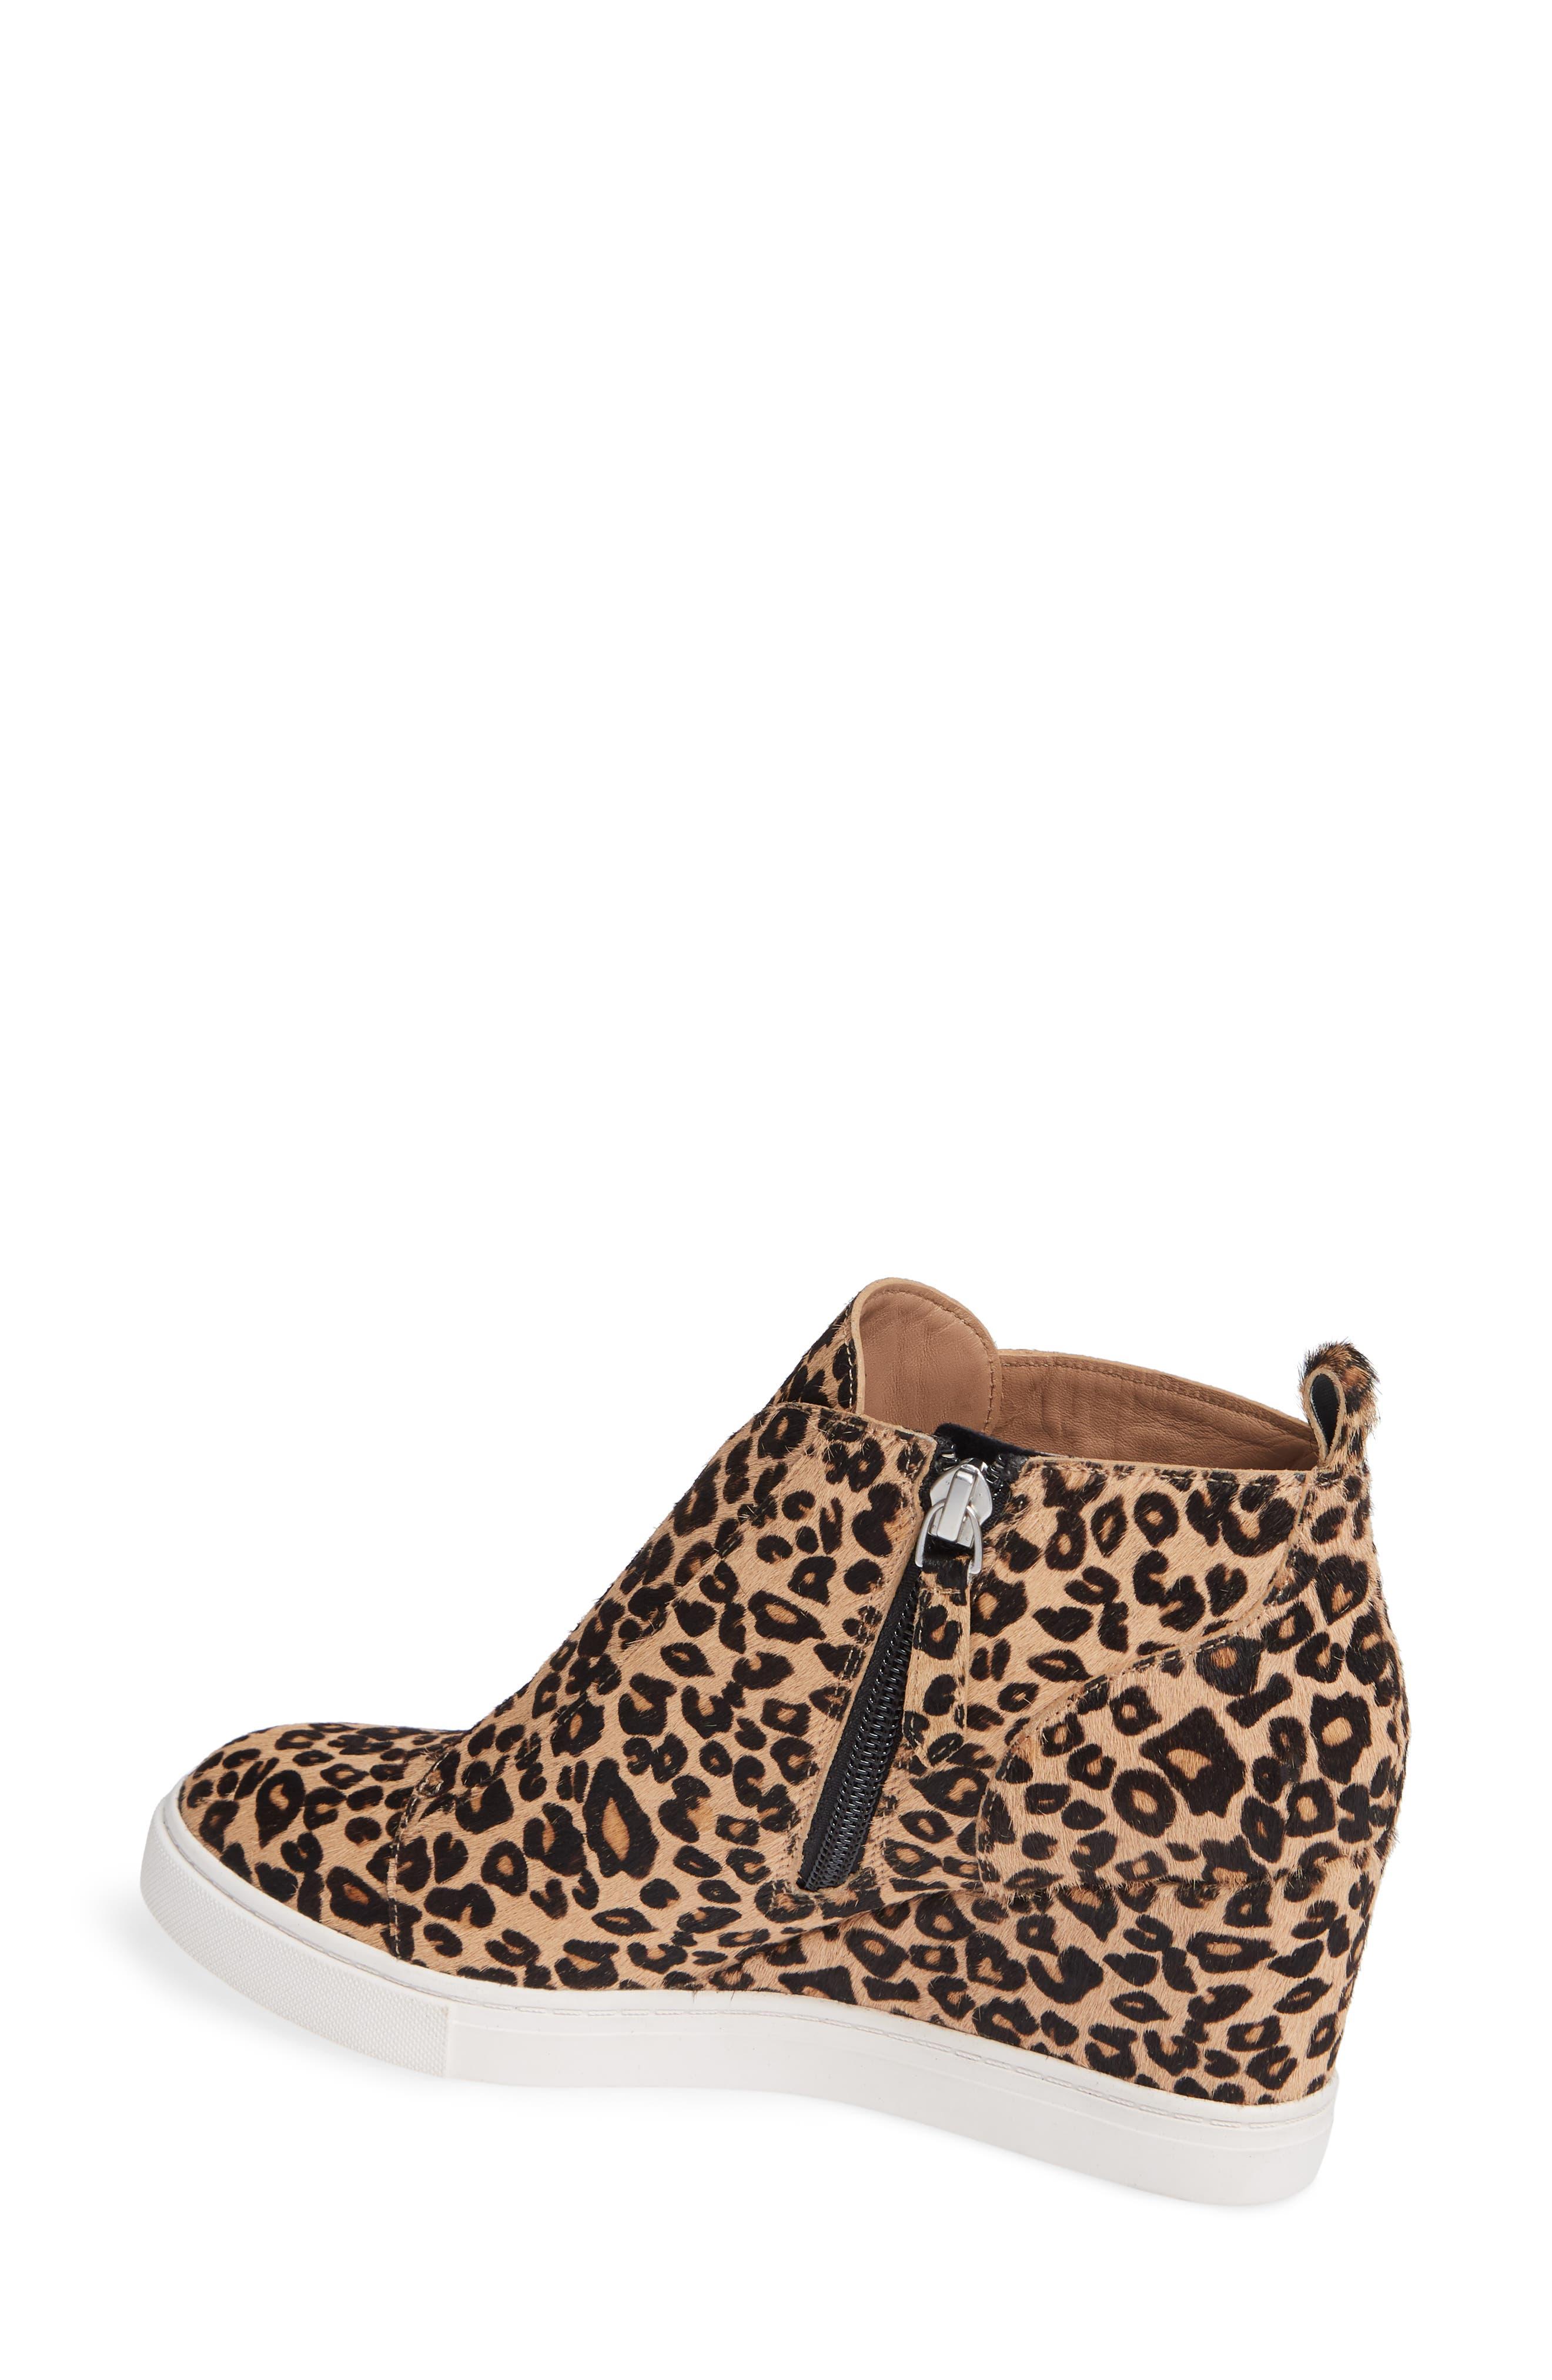 LINEA PAOLO, Felicia III Genuine Calf Hair Wedge Sneaker, Alternate thumbnail 2, color, LEOPARD PRINT HAIR CALF